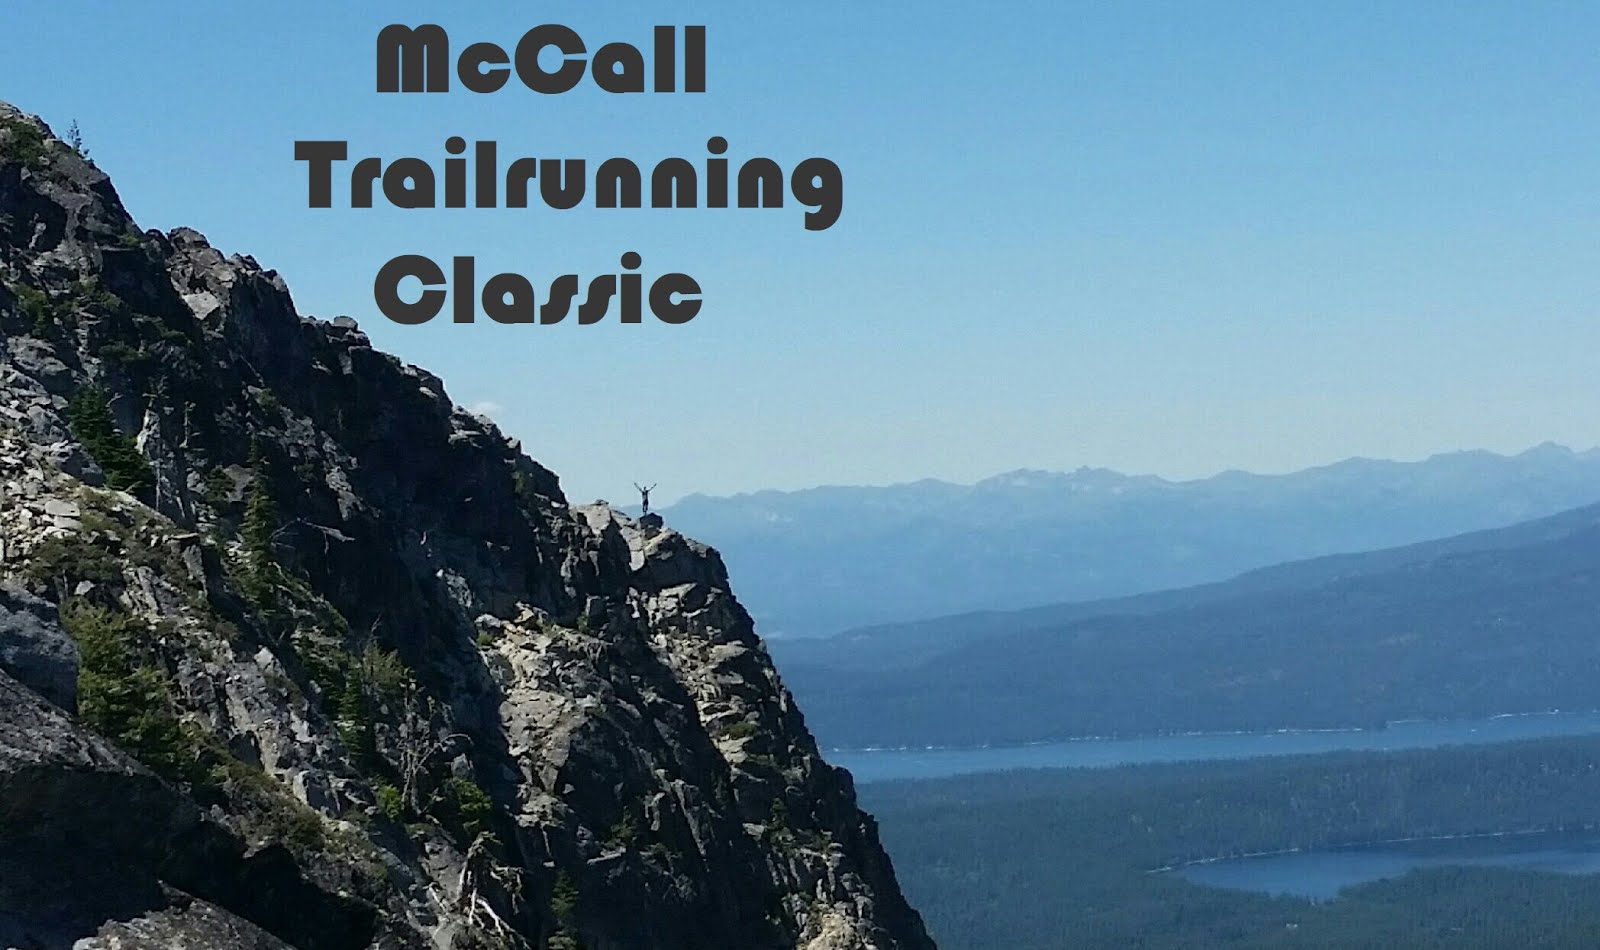 McCall Trailrunning Classic